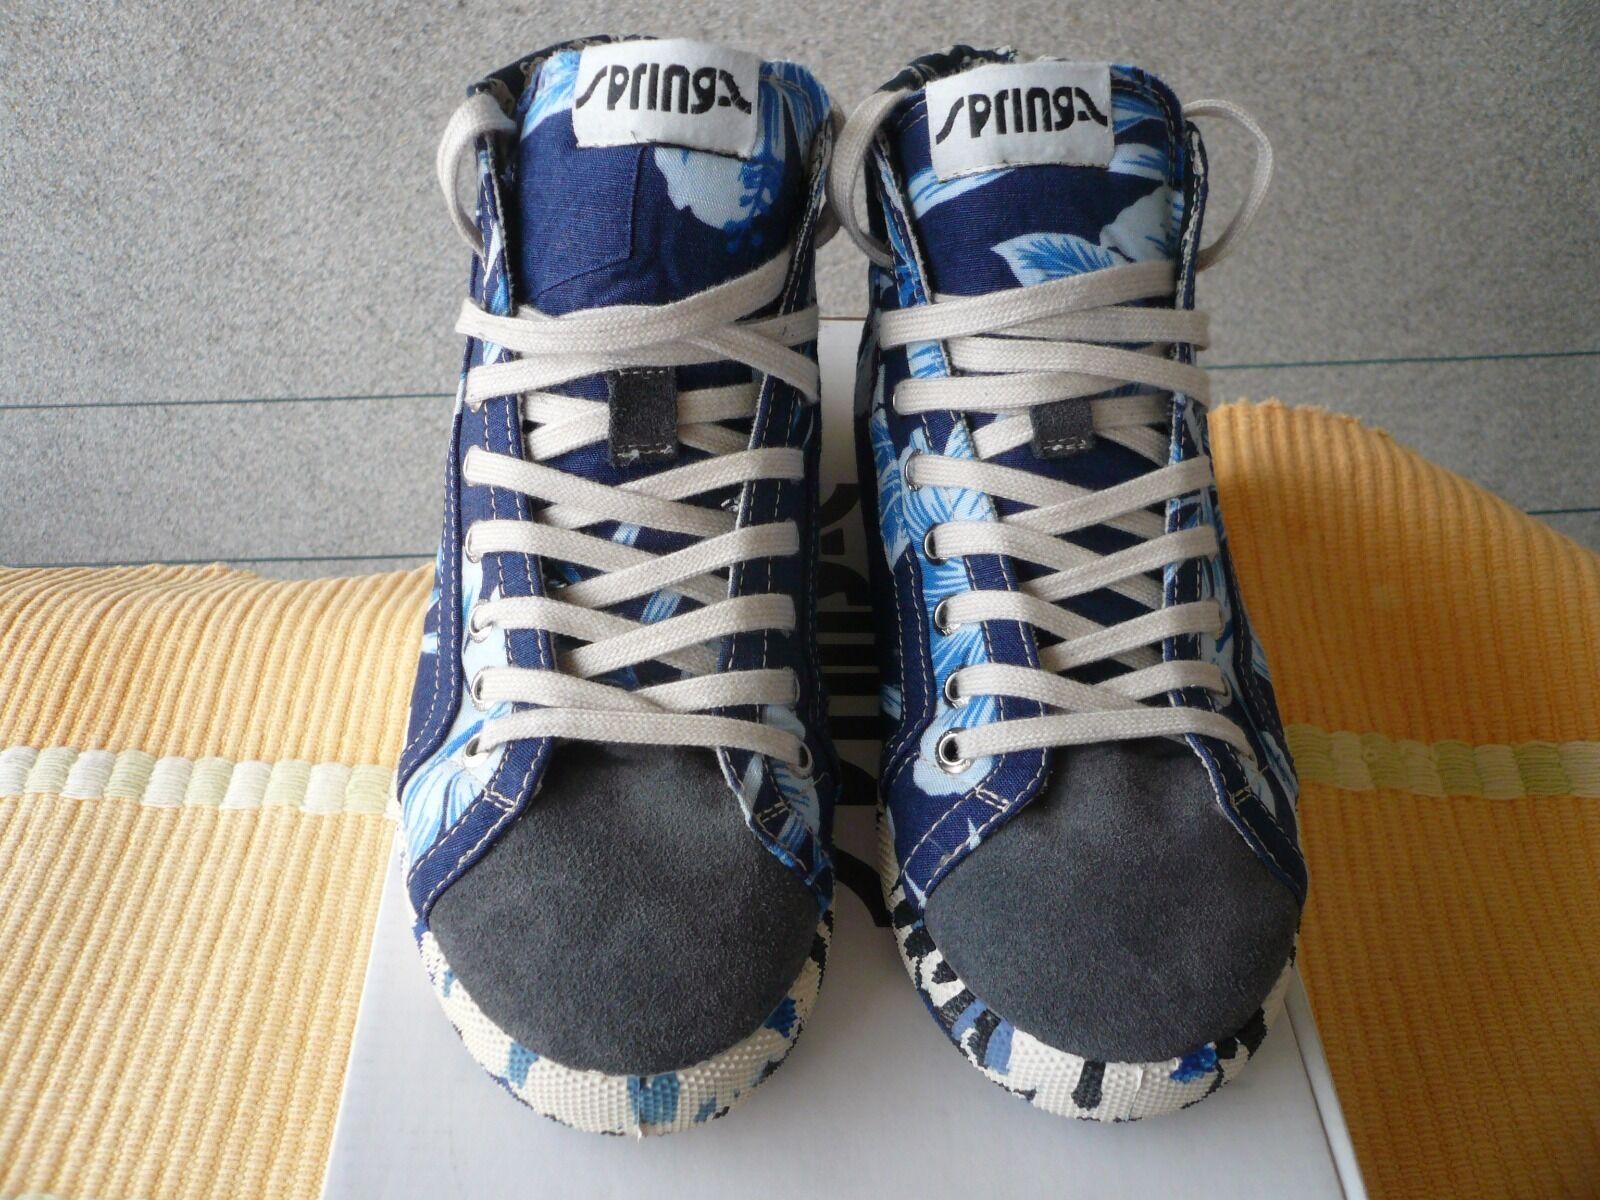 Baskets, Turnchaussures, chaussures, chaussures, chaussures, femme SPRINGA pointure 38